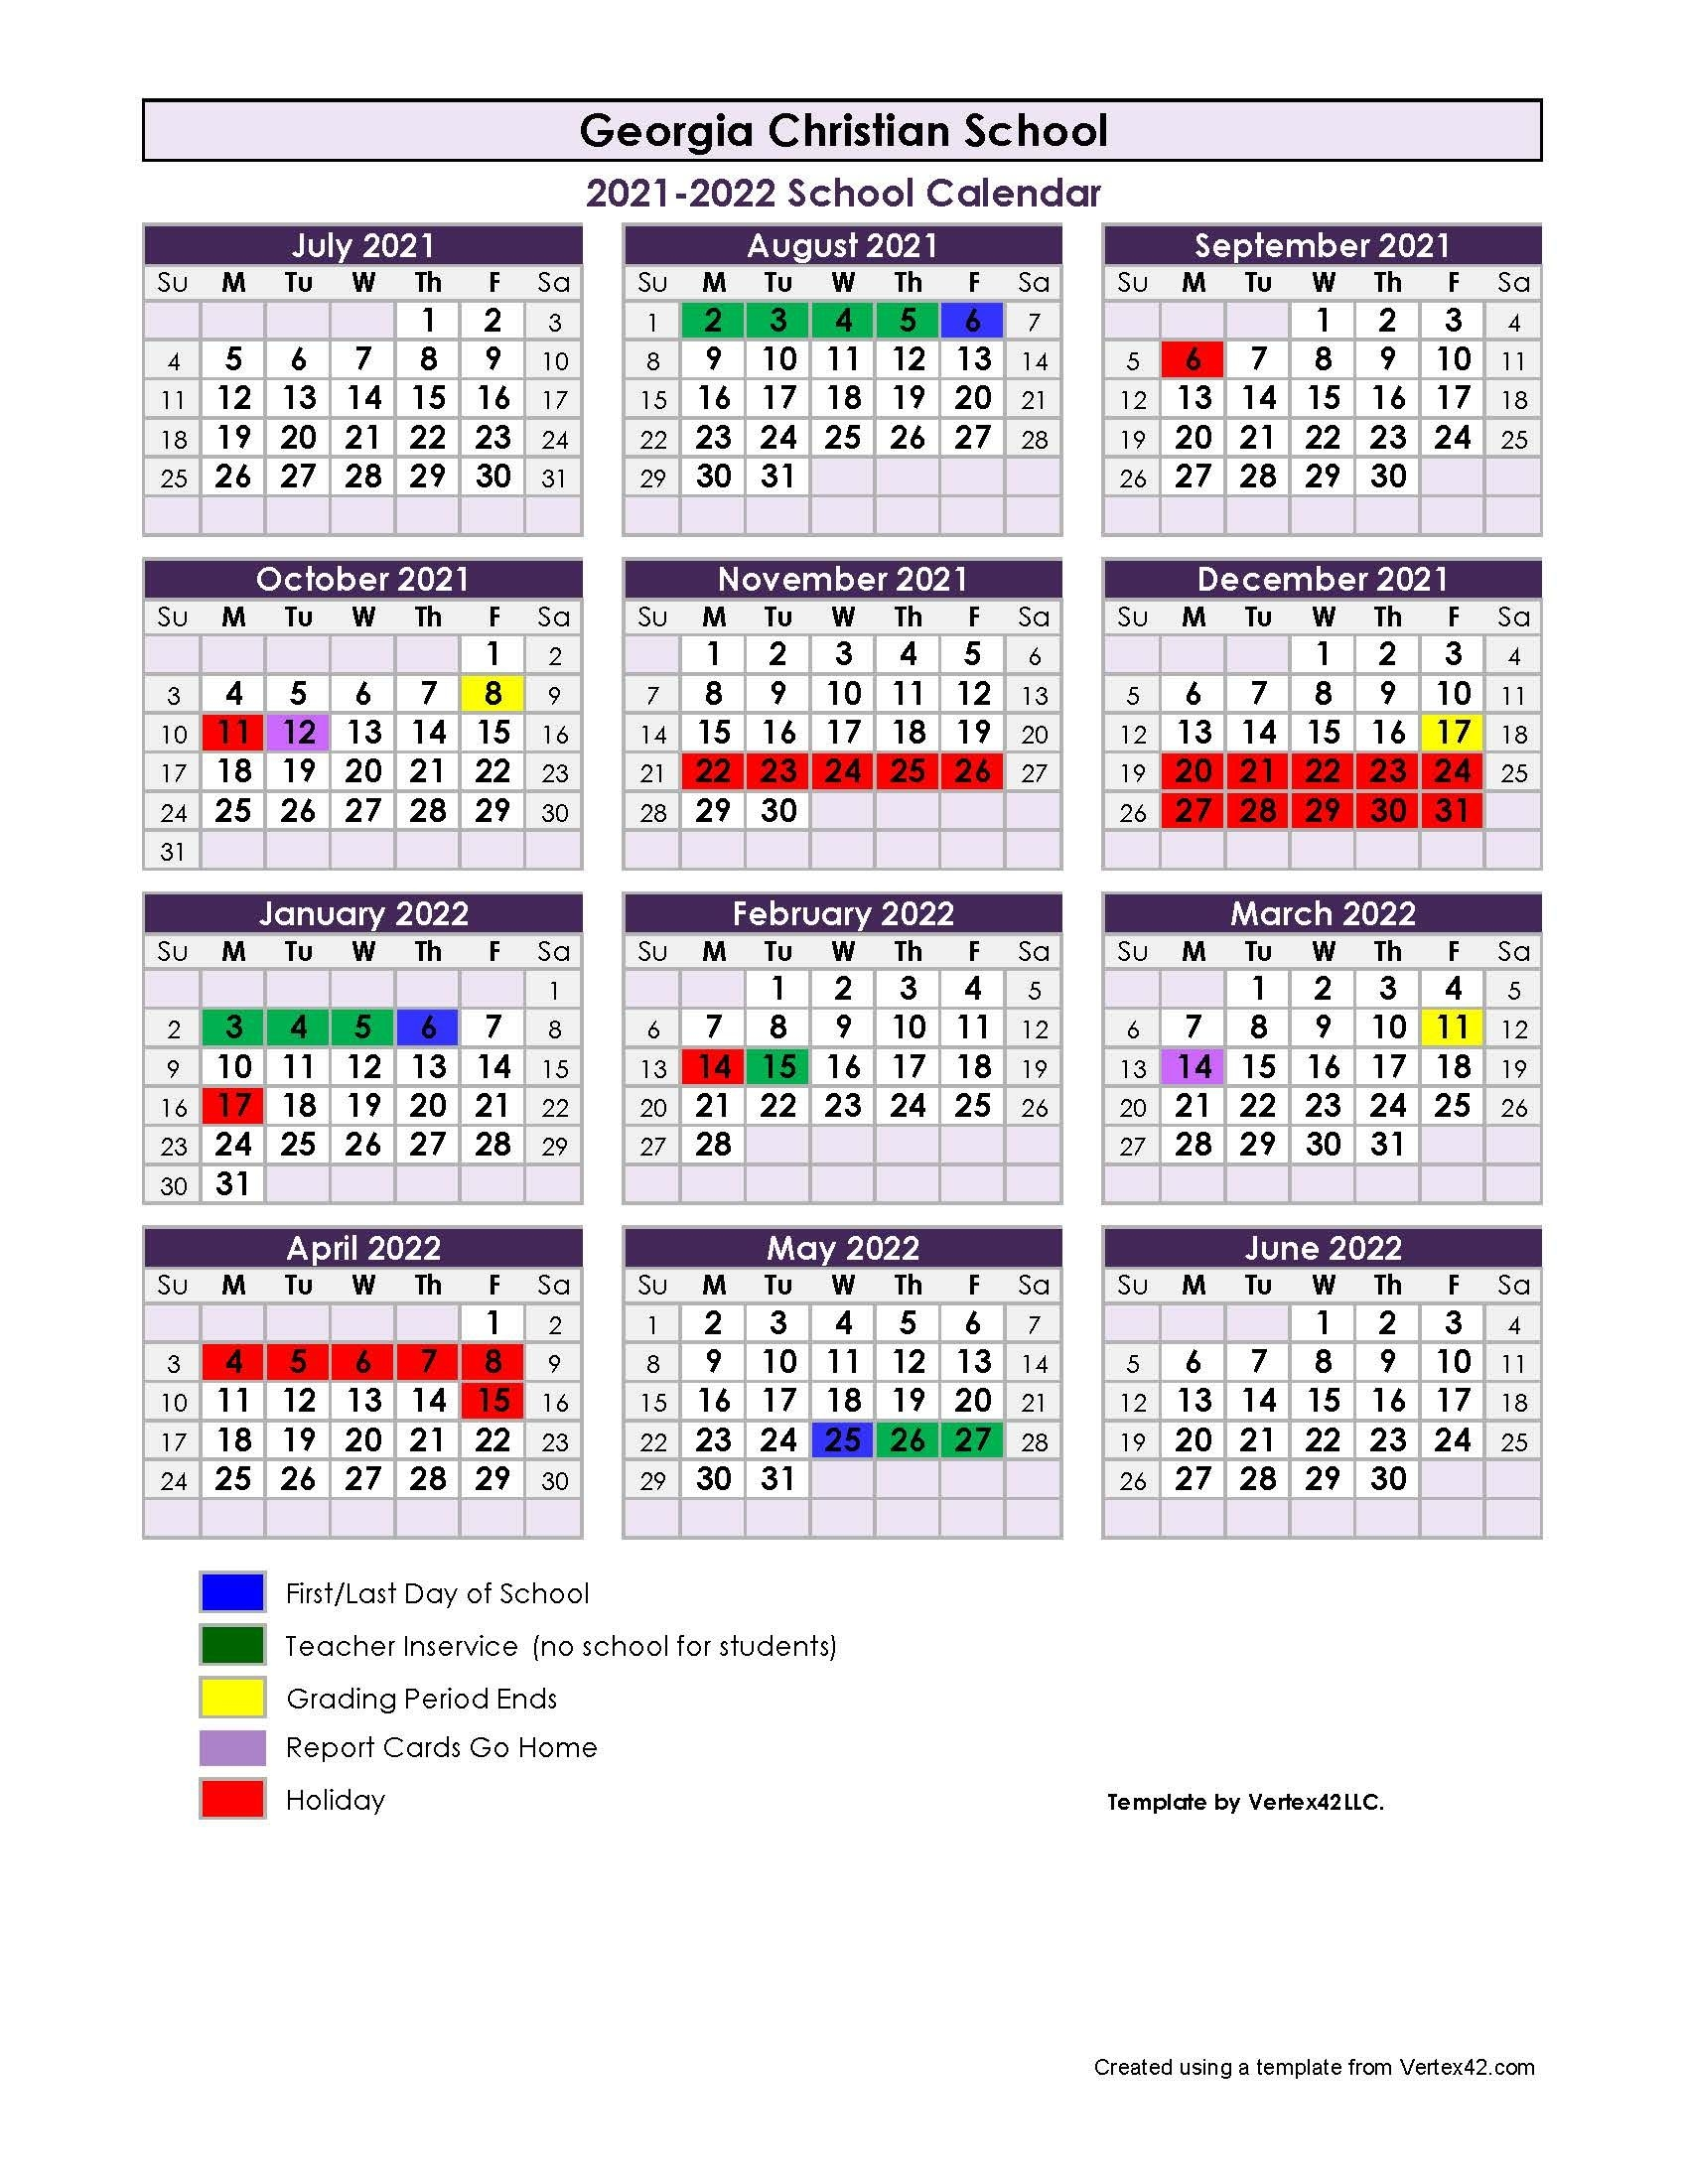 2021-22 School Calendar - Georgia Christian School